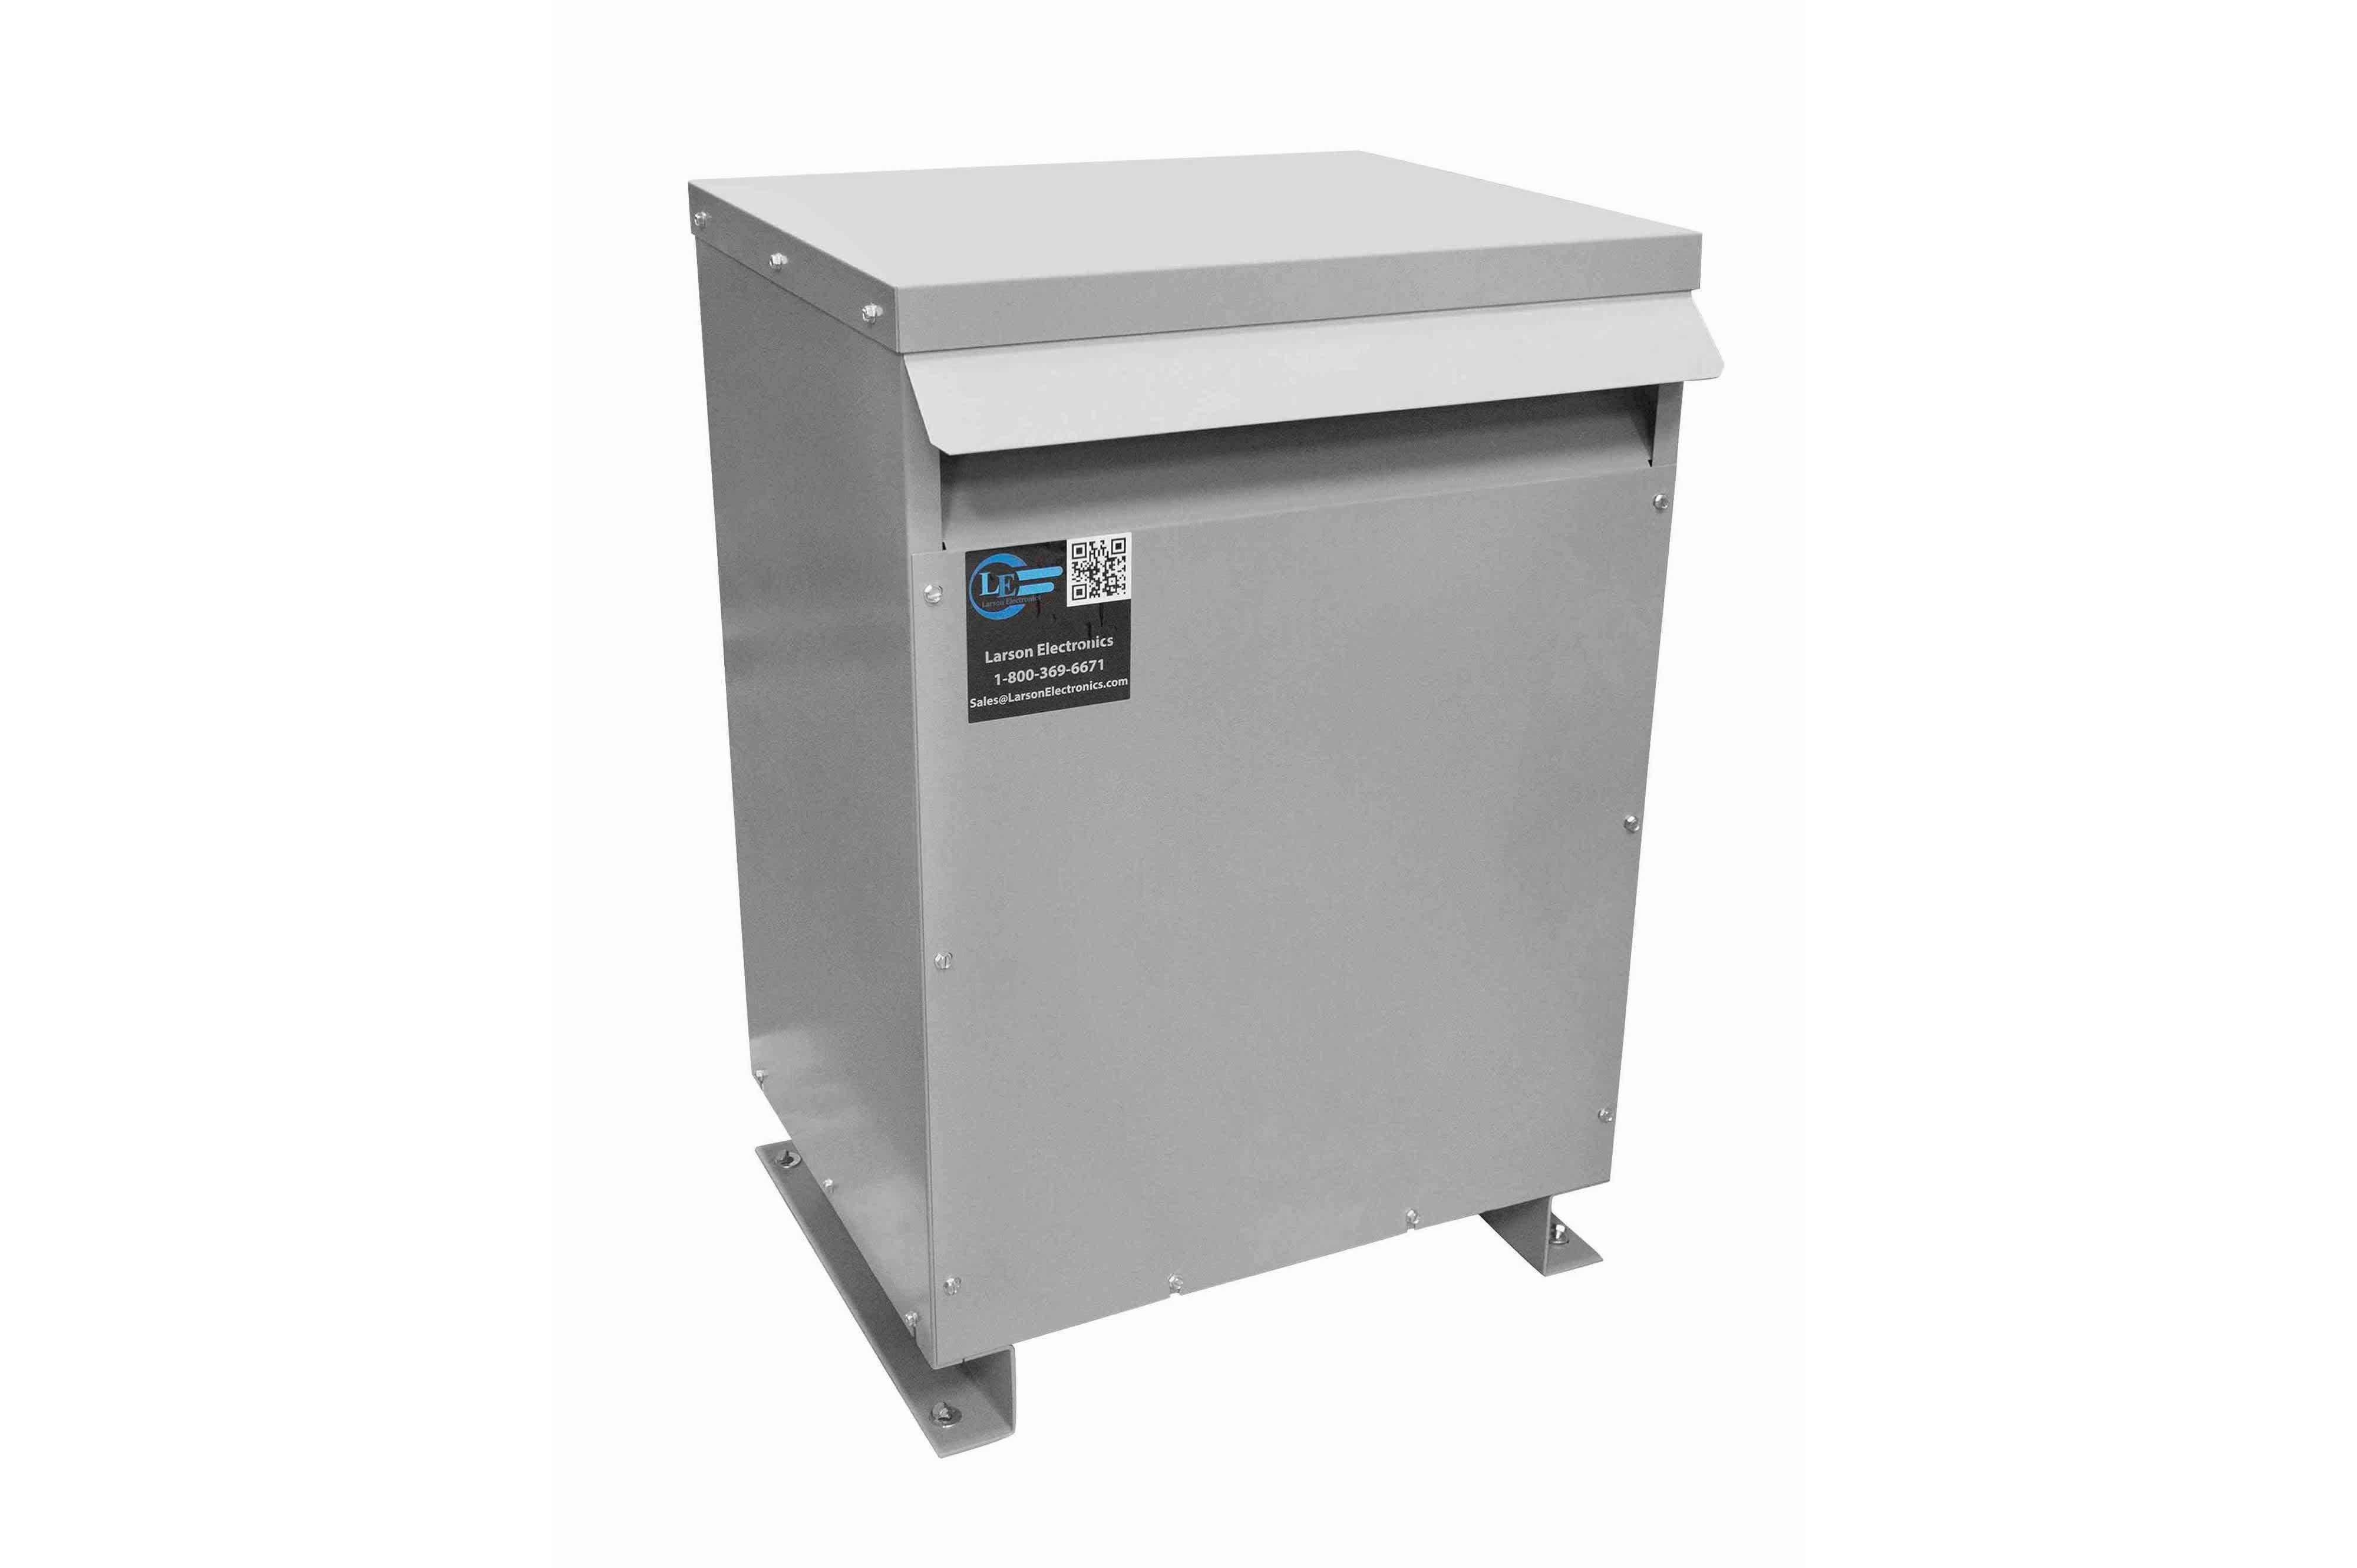 150 kVA 3PH Isolation Transformer, 240V Wye Primary, 415V Delta Secondary, N3R, Ventilated, 60 Hz